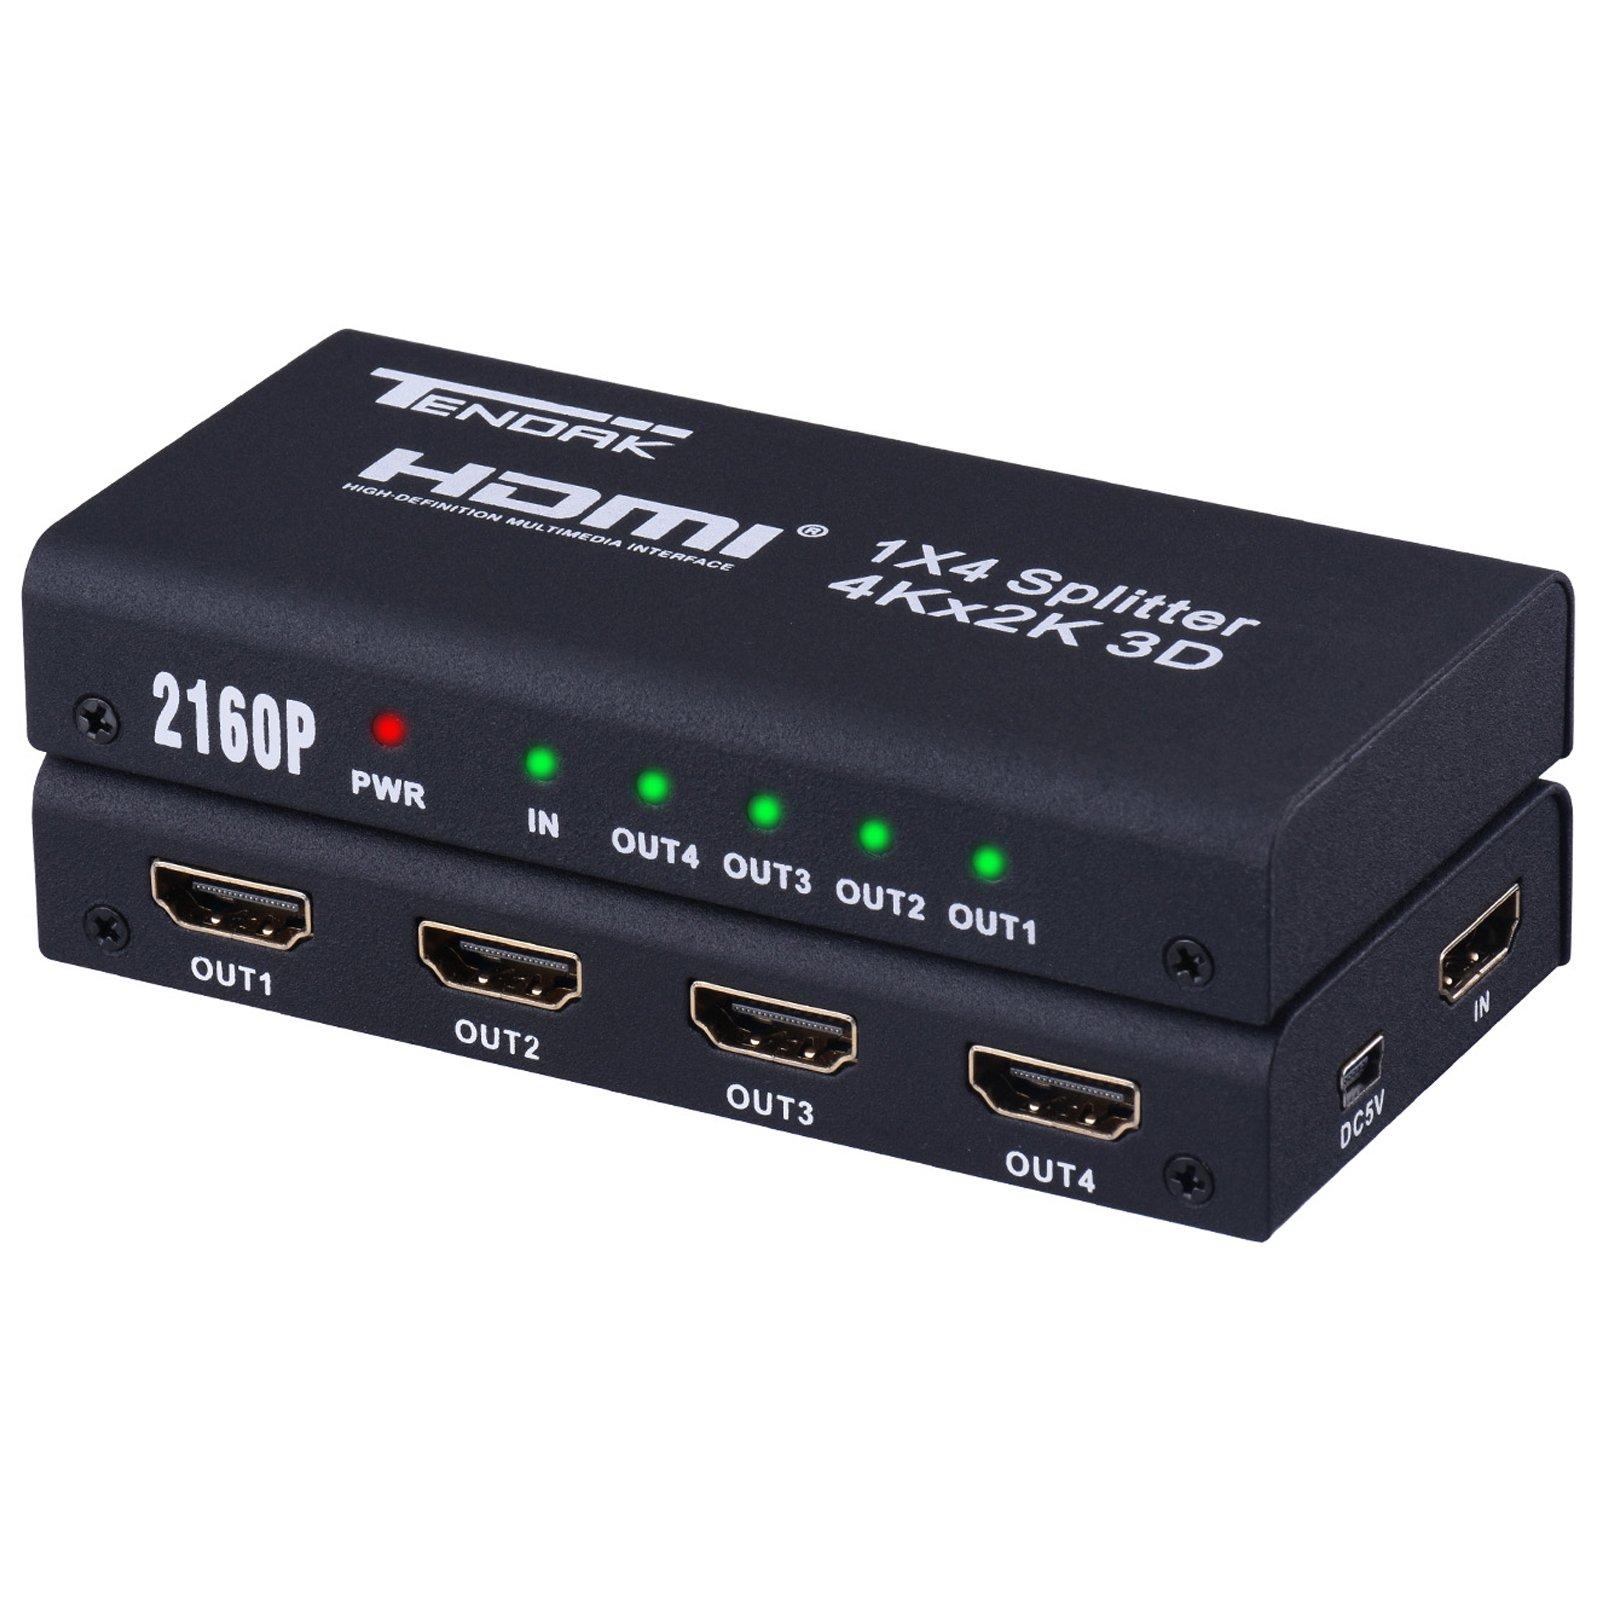 1X4 HDMI Splitter - Tendak 1 In 4 Out HDMI Powered Splitter Amplifier Signal Distributor Support 4K@30HZ 1080P 3D for Roku DirecTV PS3/4 Xbox Blu-ray